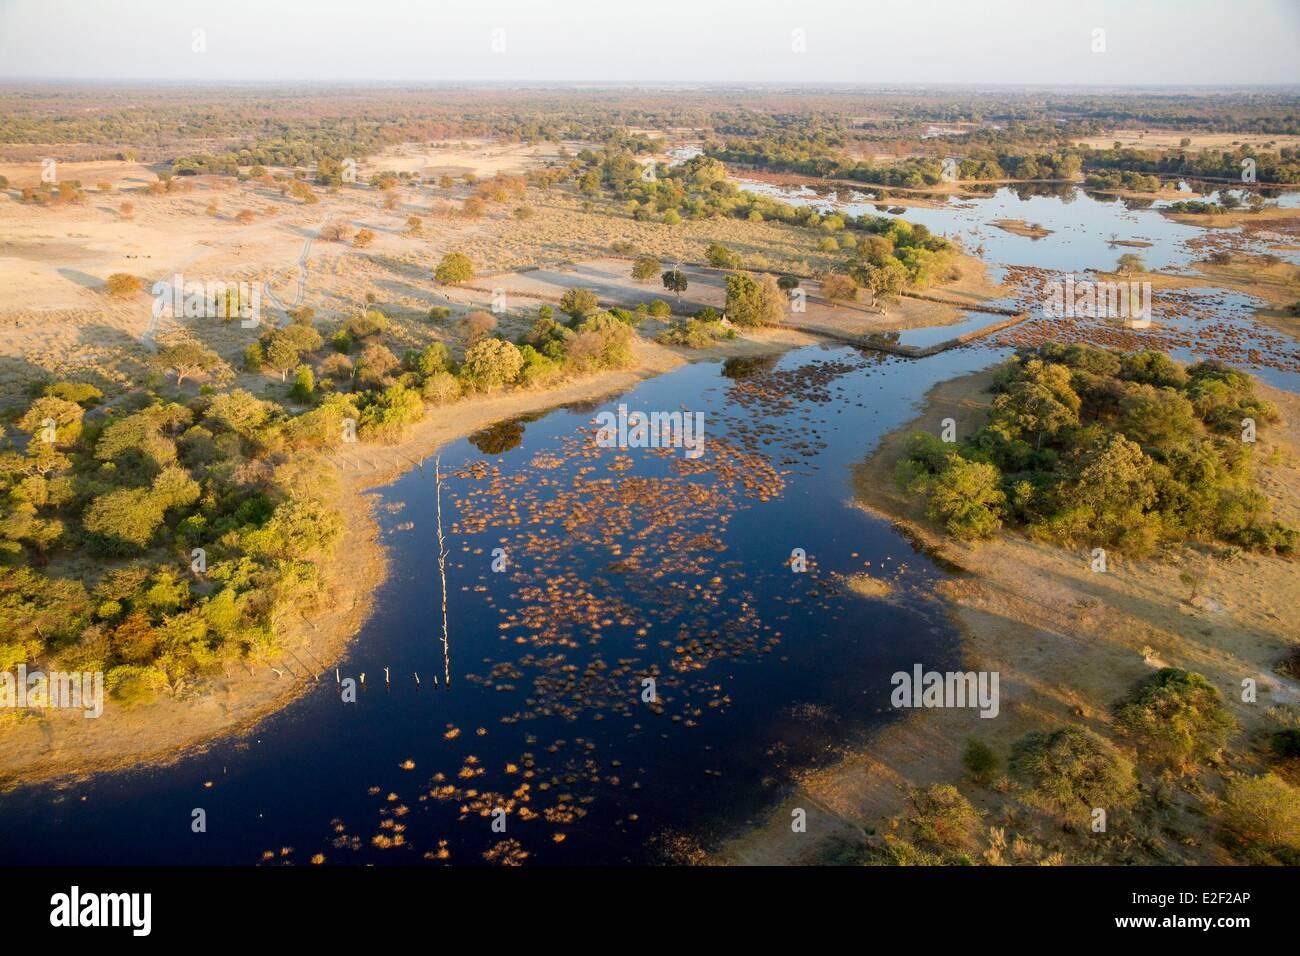 Botswana, Okavango delta (aerial view) - Stock Image